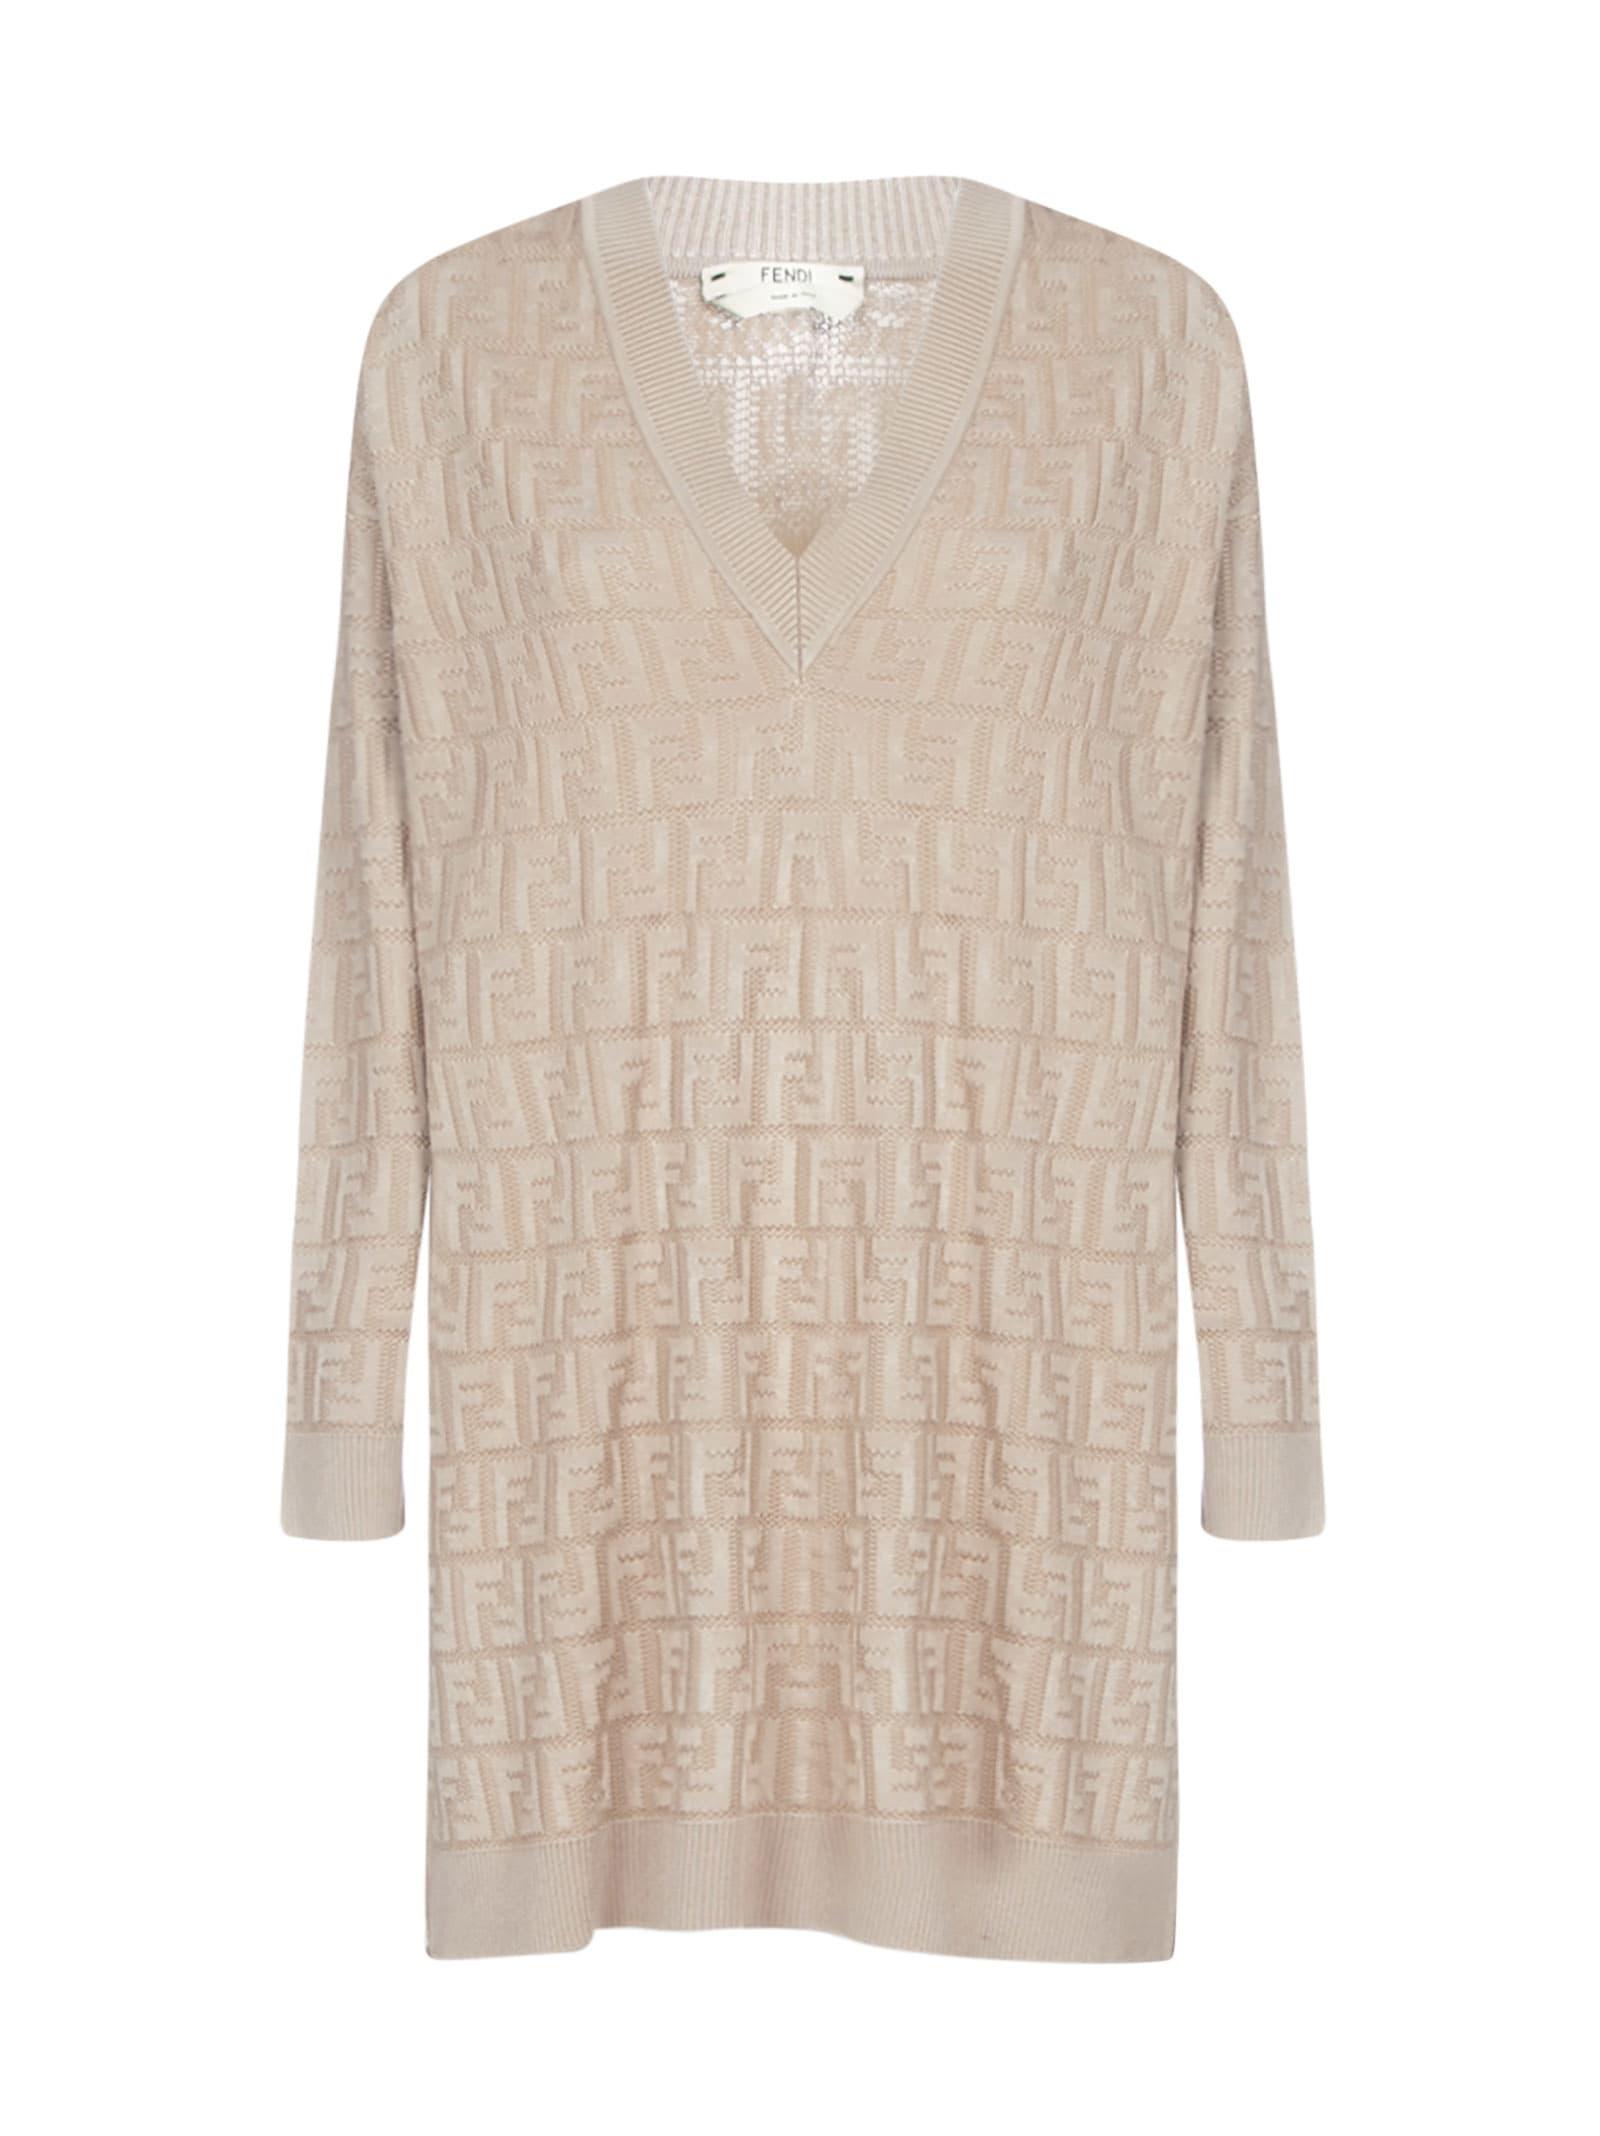 Buy Fendi V Neck Long Sleeves Ff Dress online, shop Fendi with free shipping